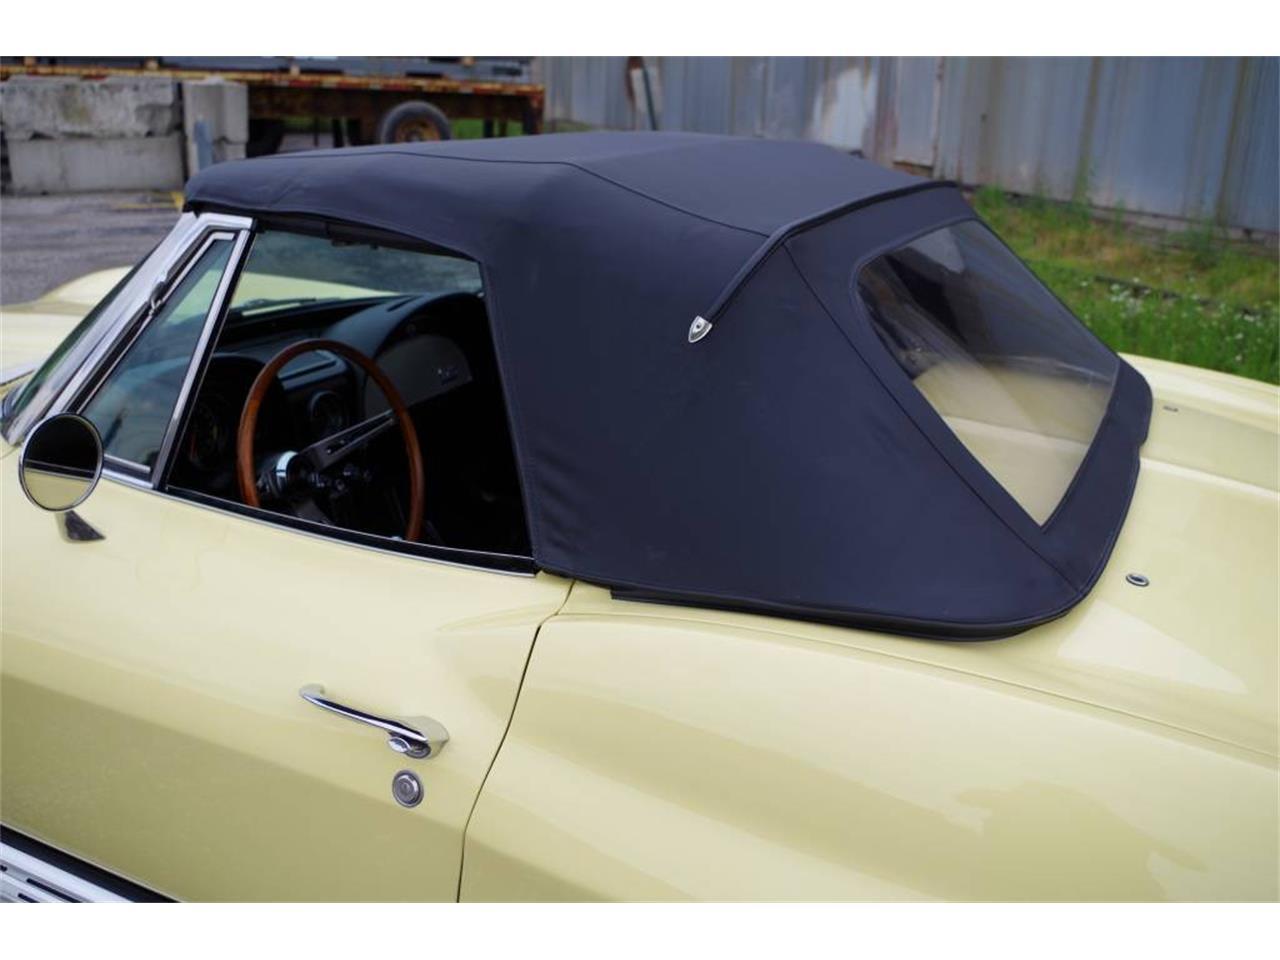 Large Picture of Classic 1966 Corvette located in Missouri - $69,900.00 - MO1Z